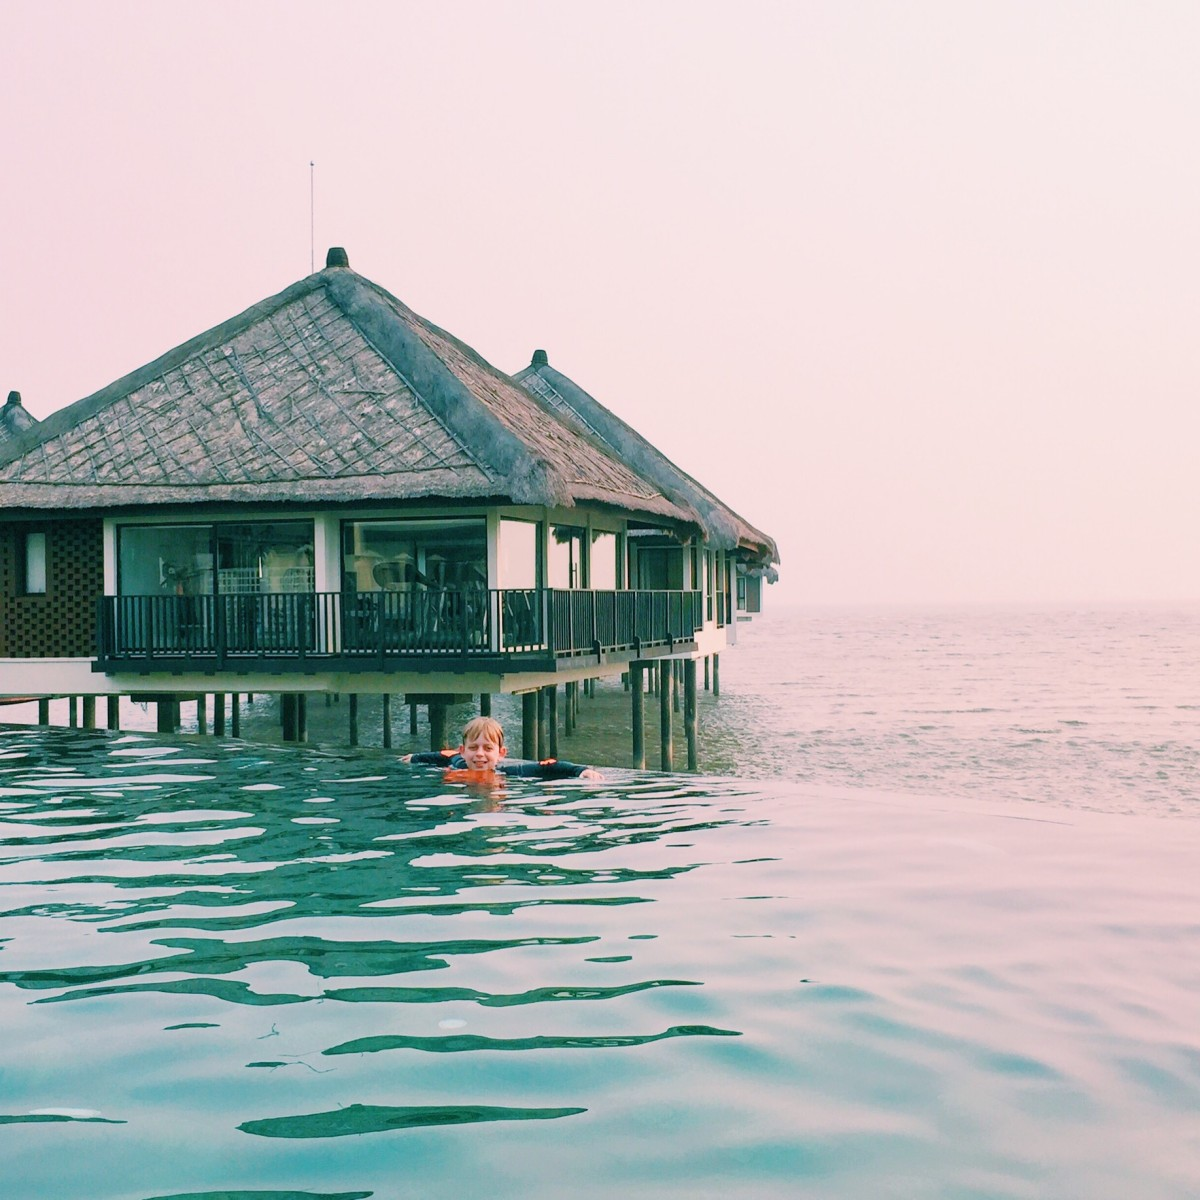 Avani Sepang Goldcoast Resort, near Kuala Lumpur, Malaysia - copyright: www.globalmousetravels.com